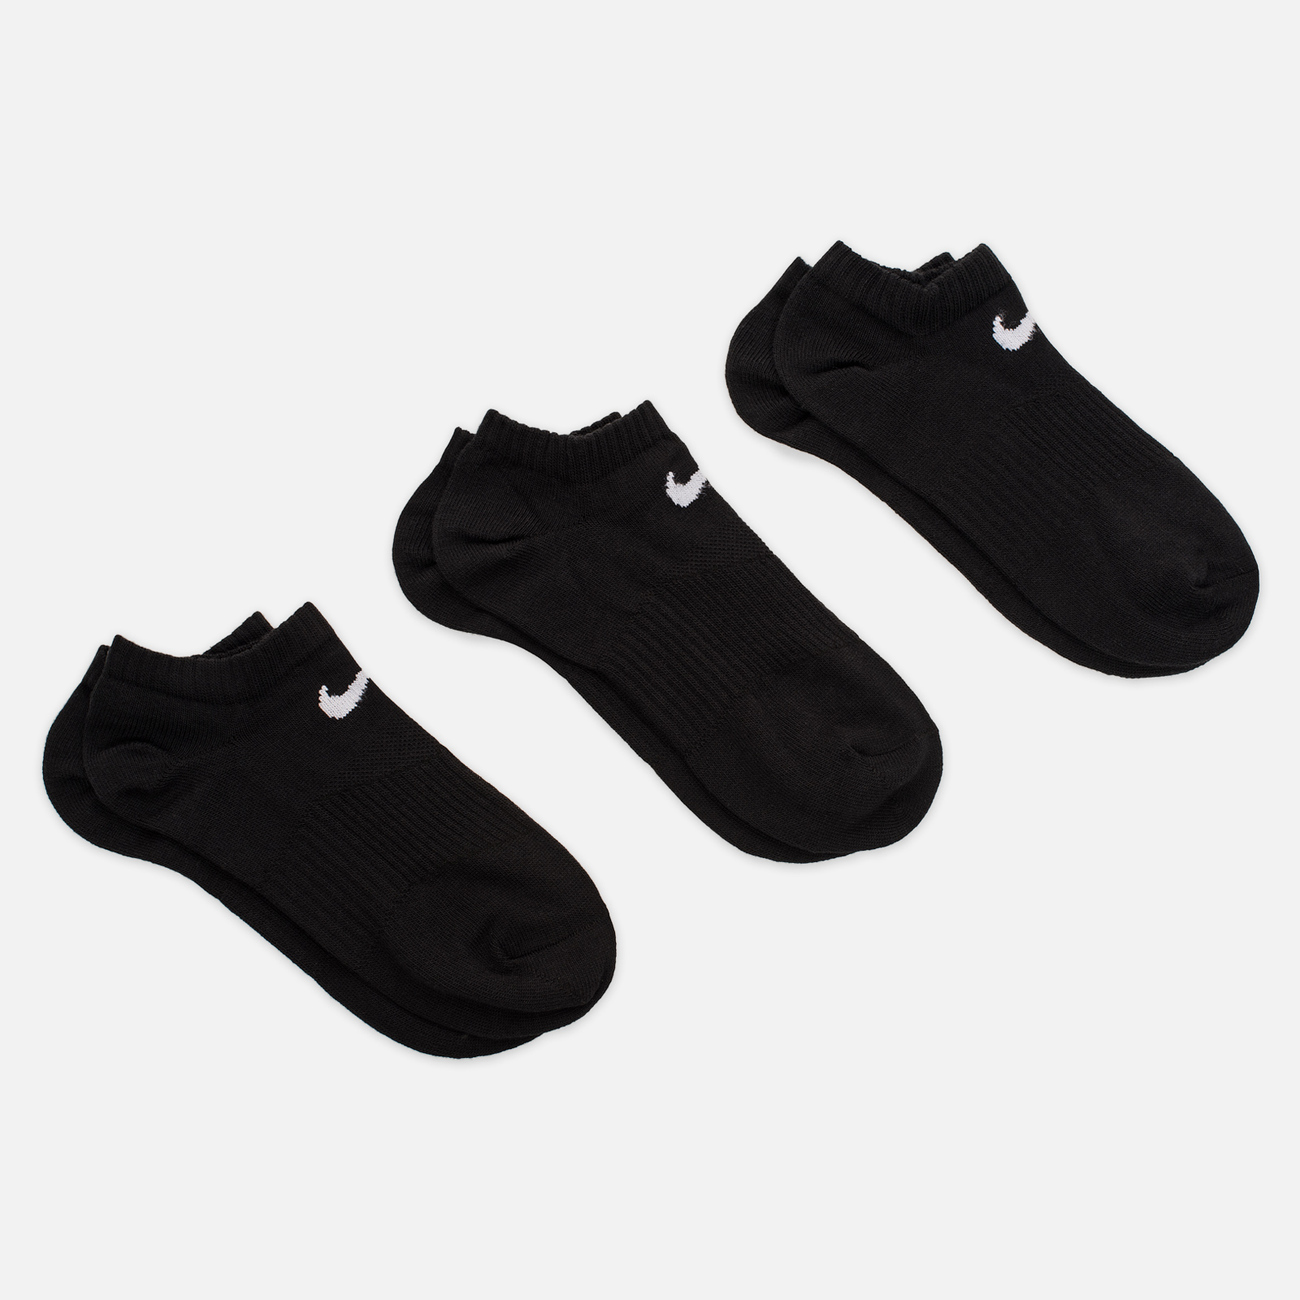 Комплект носков Nike 3-Pack Lightweight No-Show Black/Black/Black